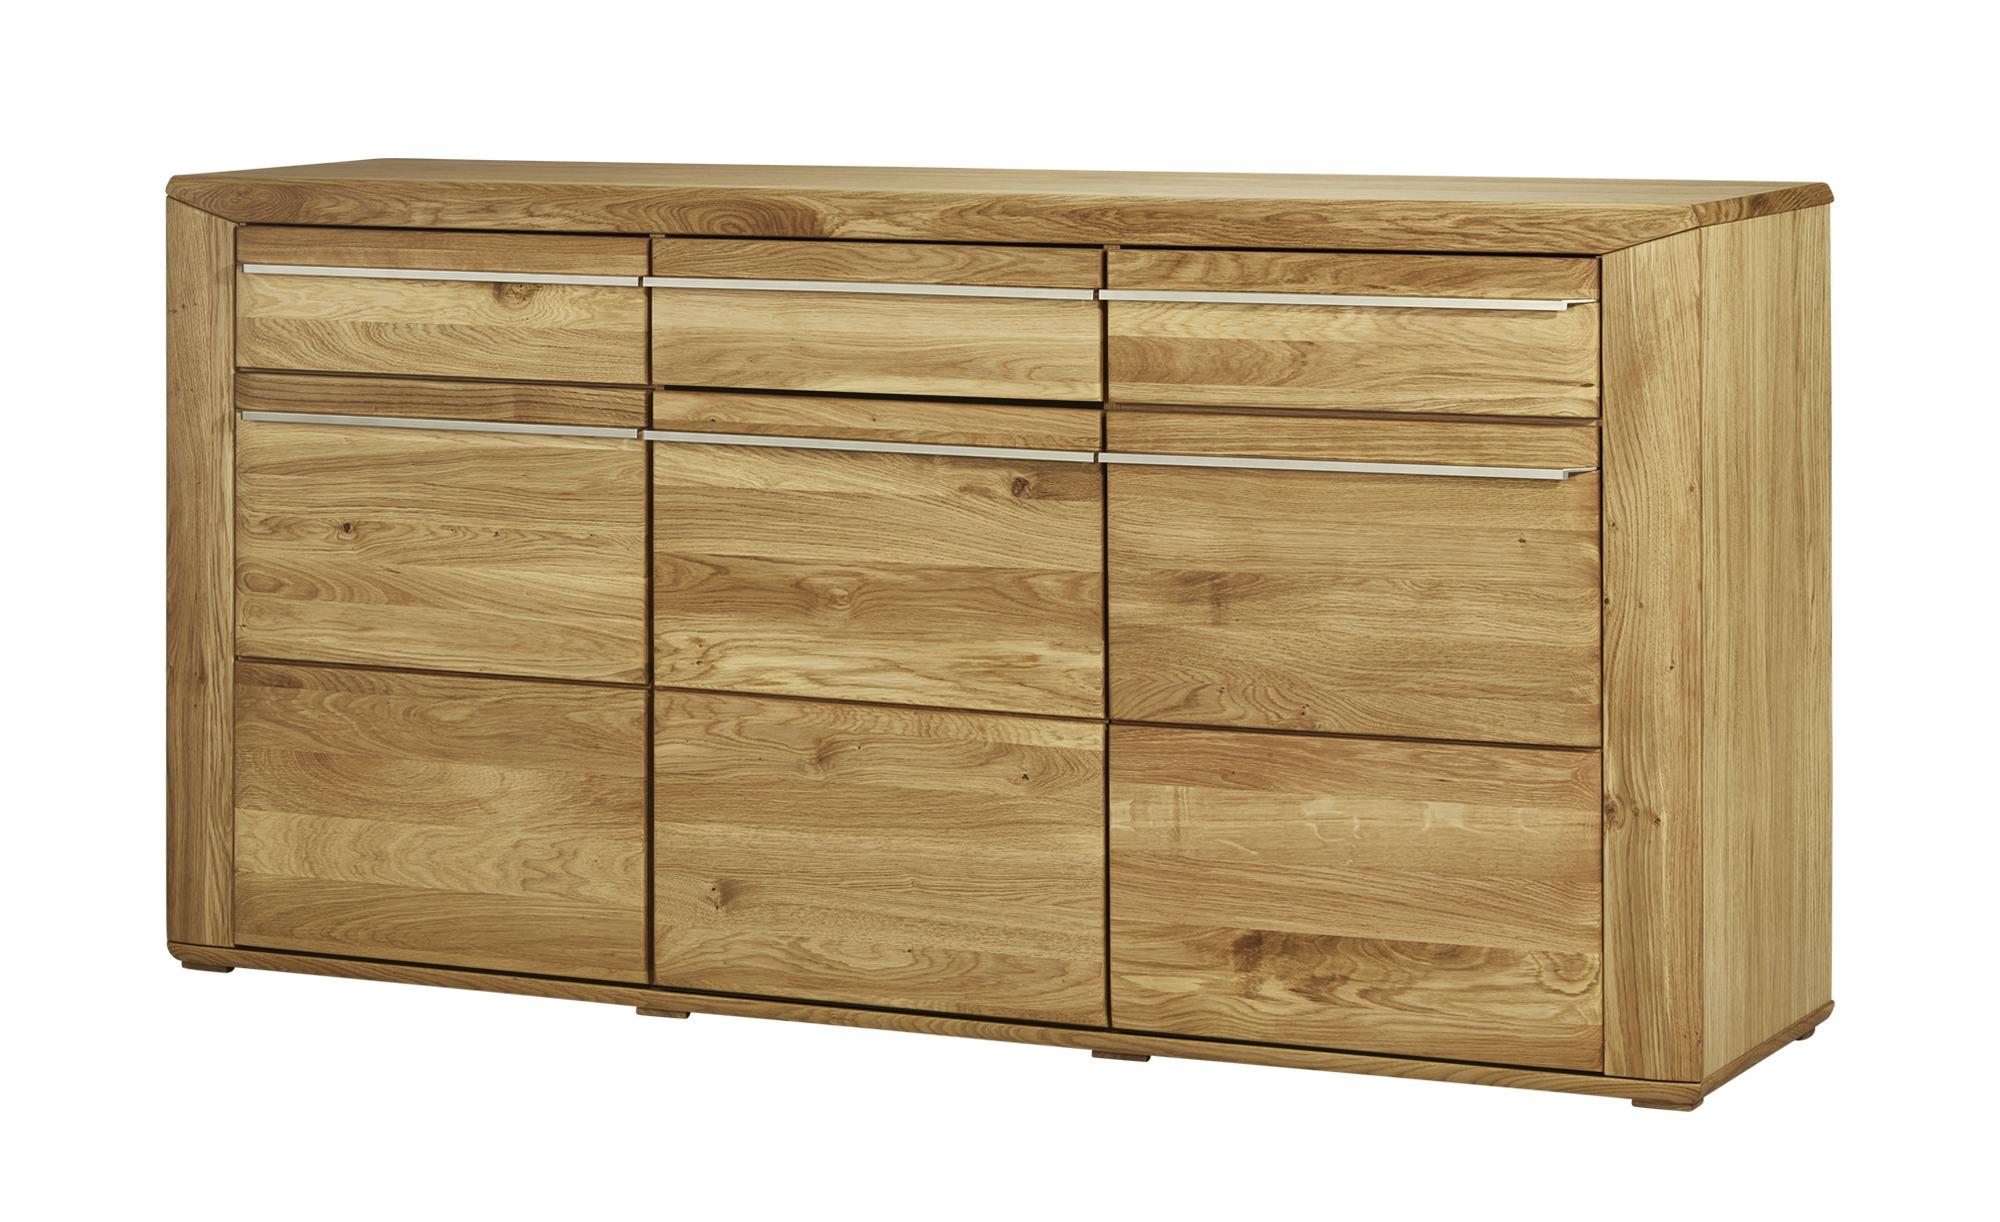 Woodford Sideboard   Leeds ¦ Maße (cm): B: 175 H: 89 T: 45 Kommoden & Sideboards > Sideboards - Höffner